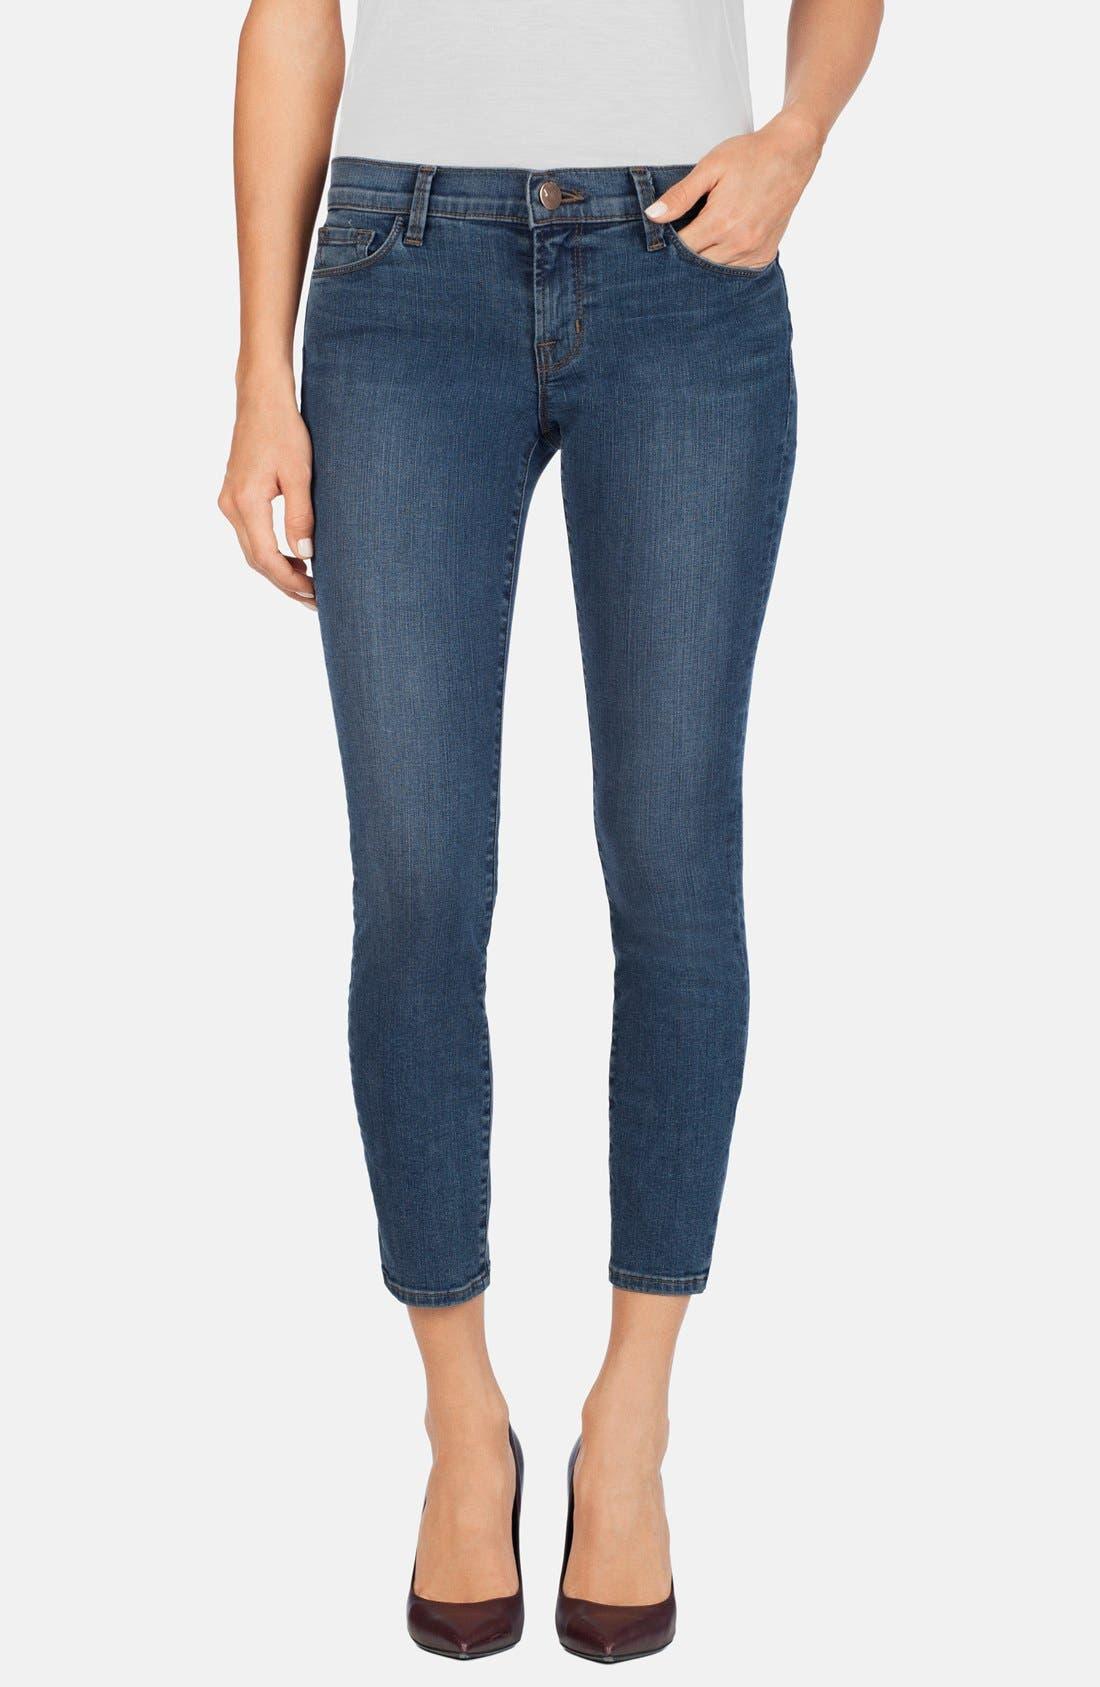 Alternate Image 1 Selected - J Brand Mid Rise Crop Skinny Jeans (Beloved)